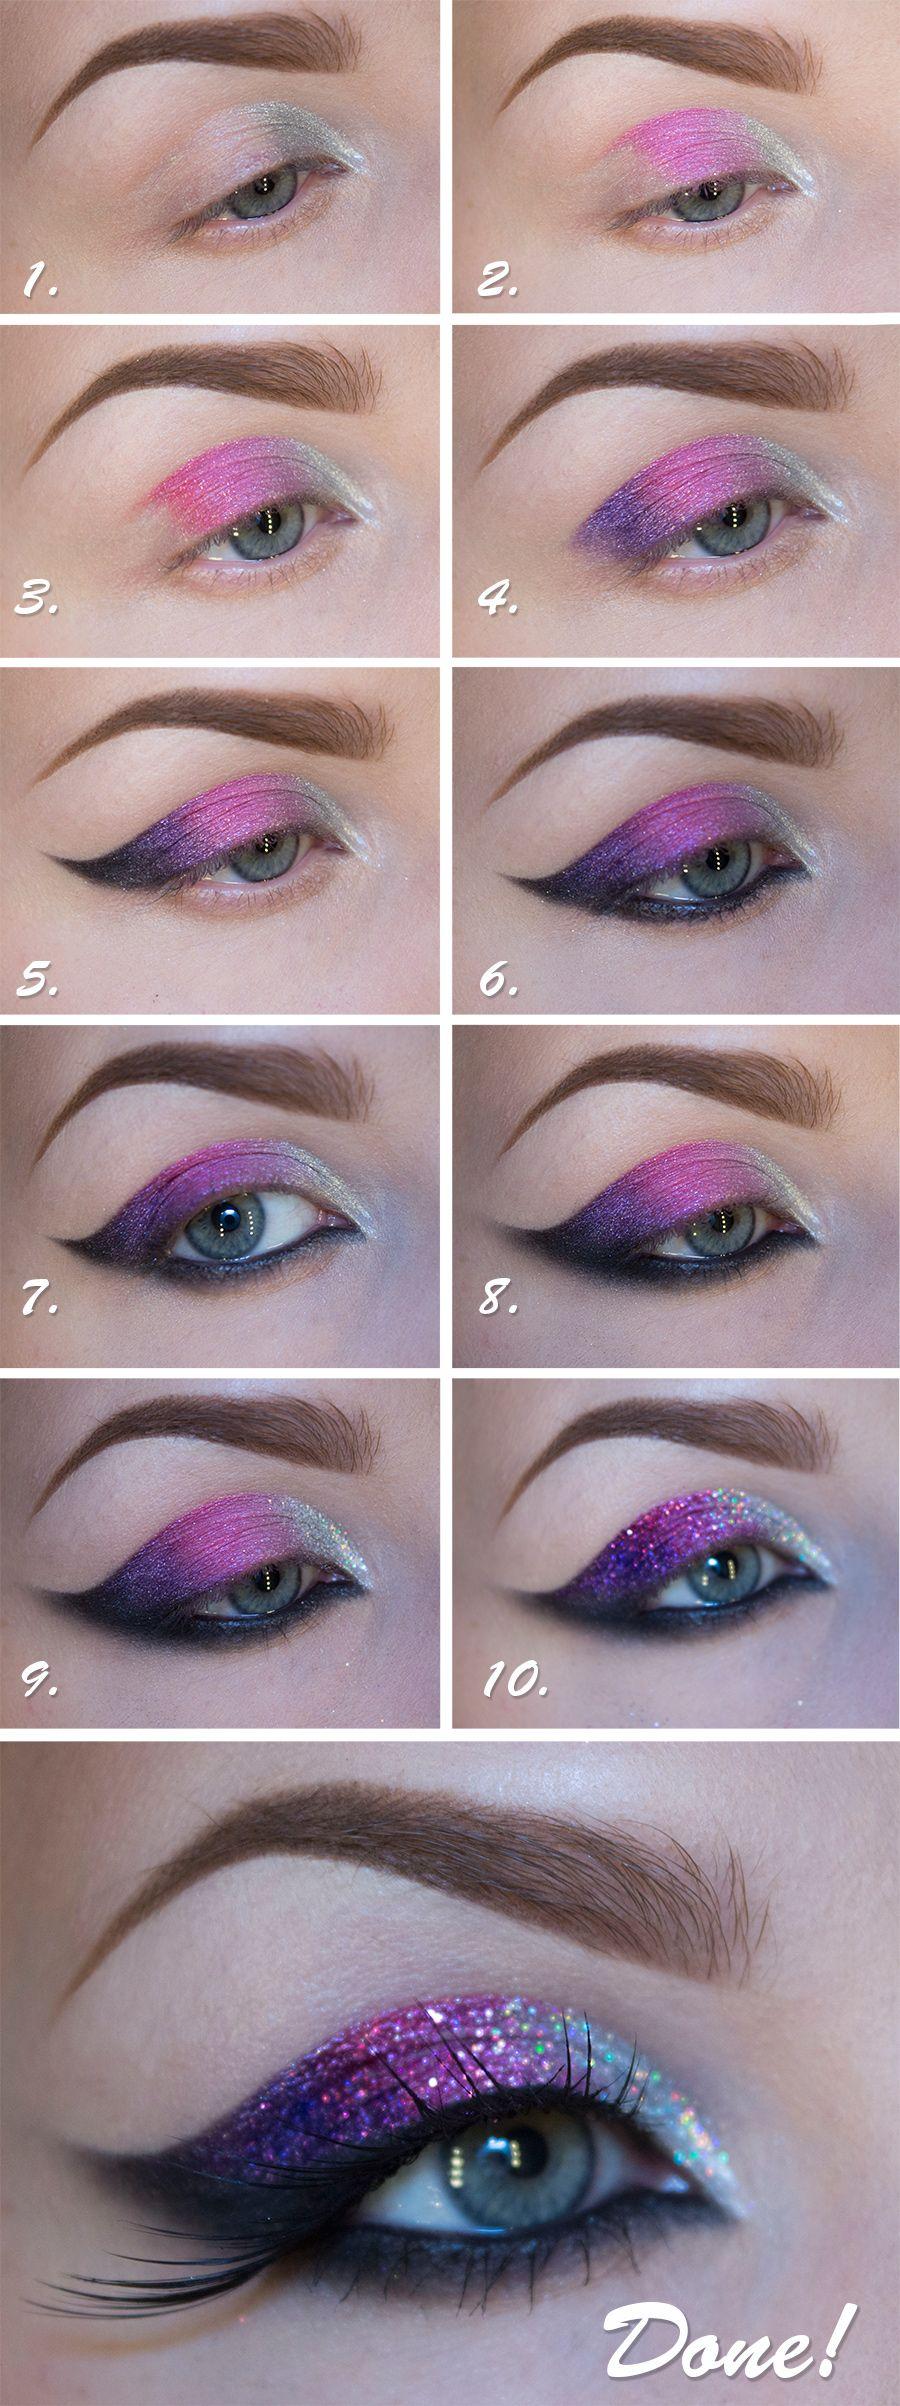 Amazing Collection of Purple Eye Makeup Tutorial - Be Modish